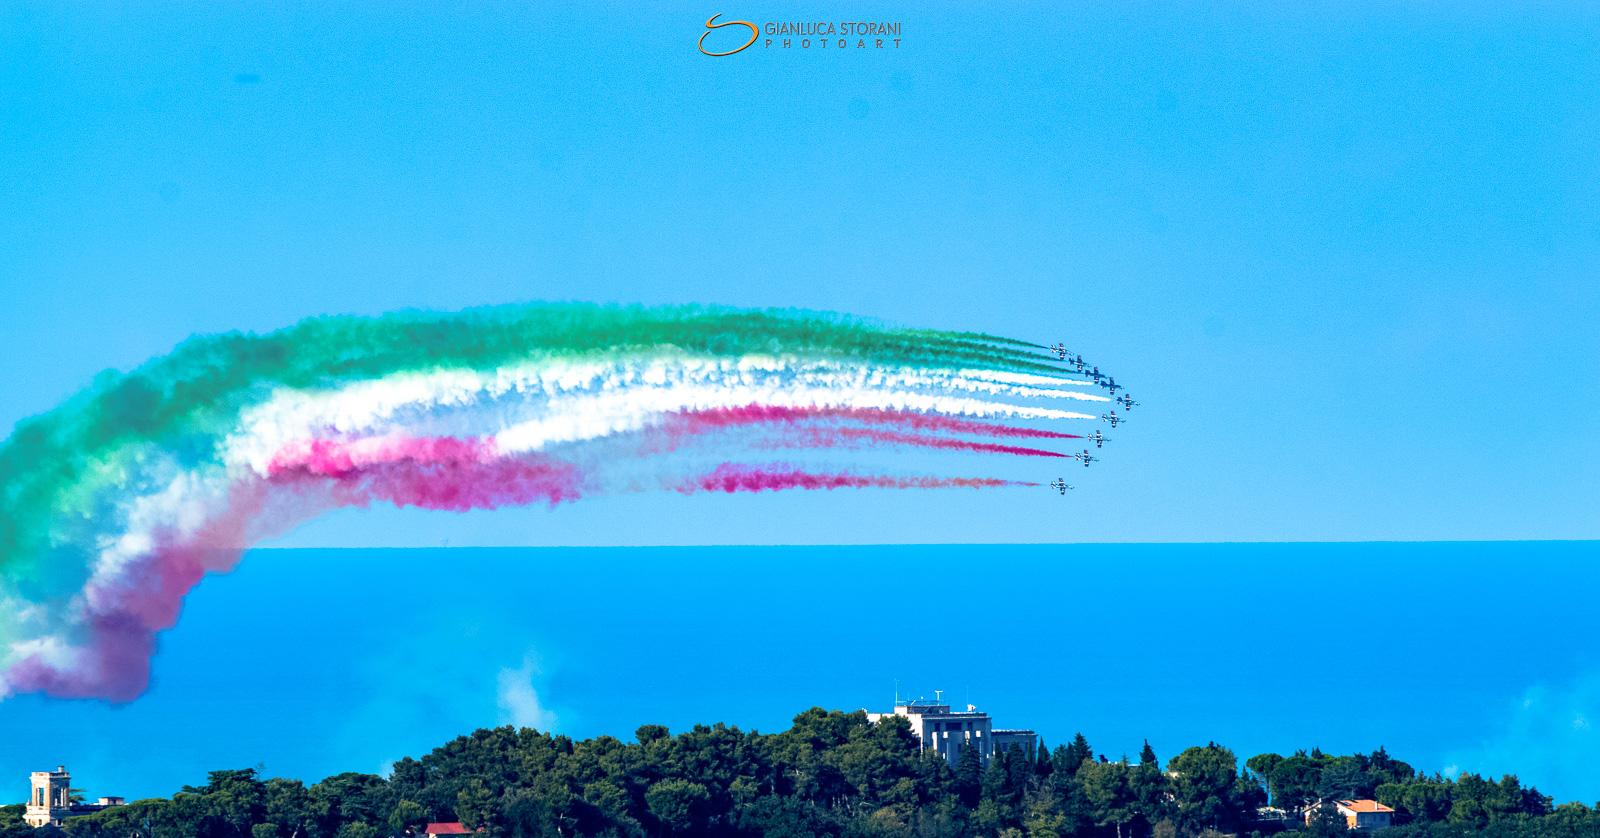 Fuga - Porto Recanati Air Show 2017 (ID: 4-0945)